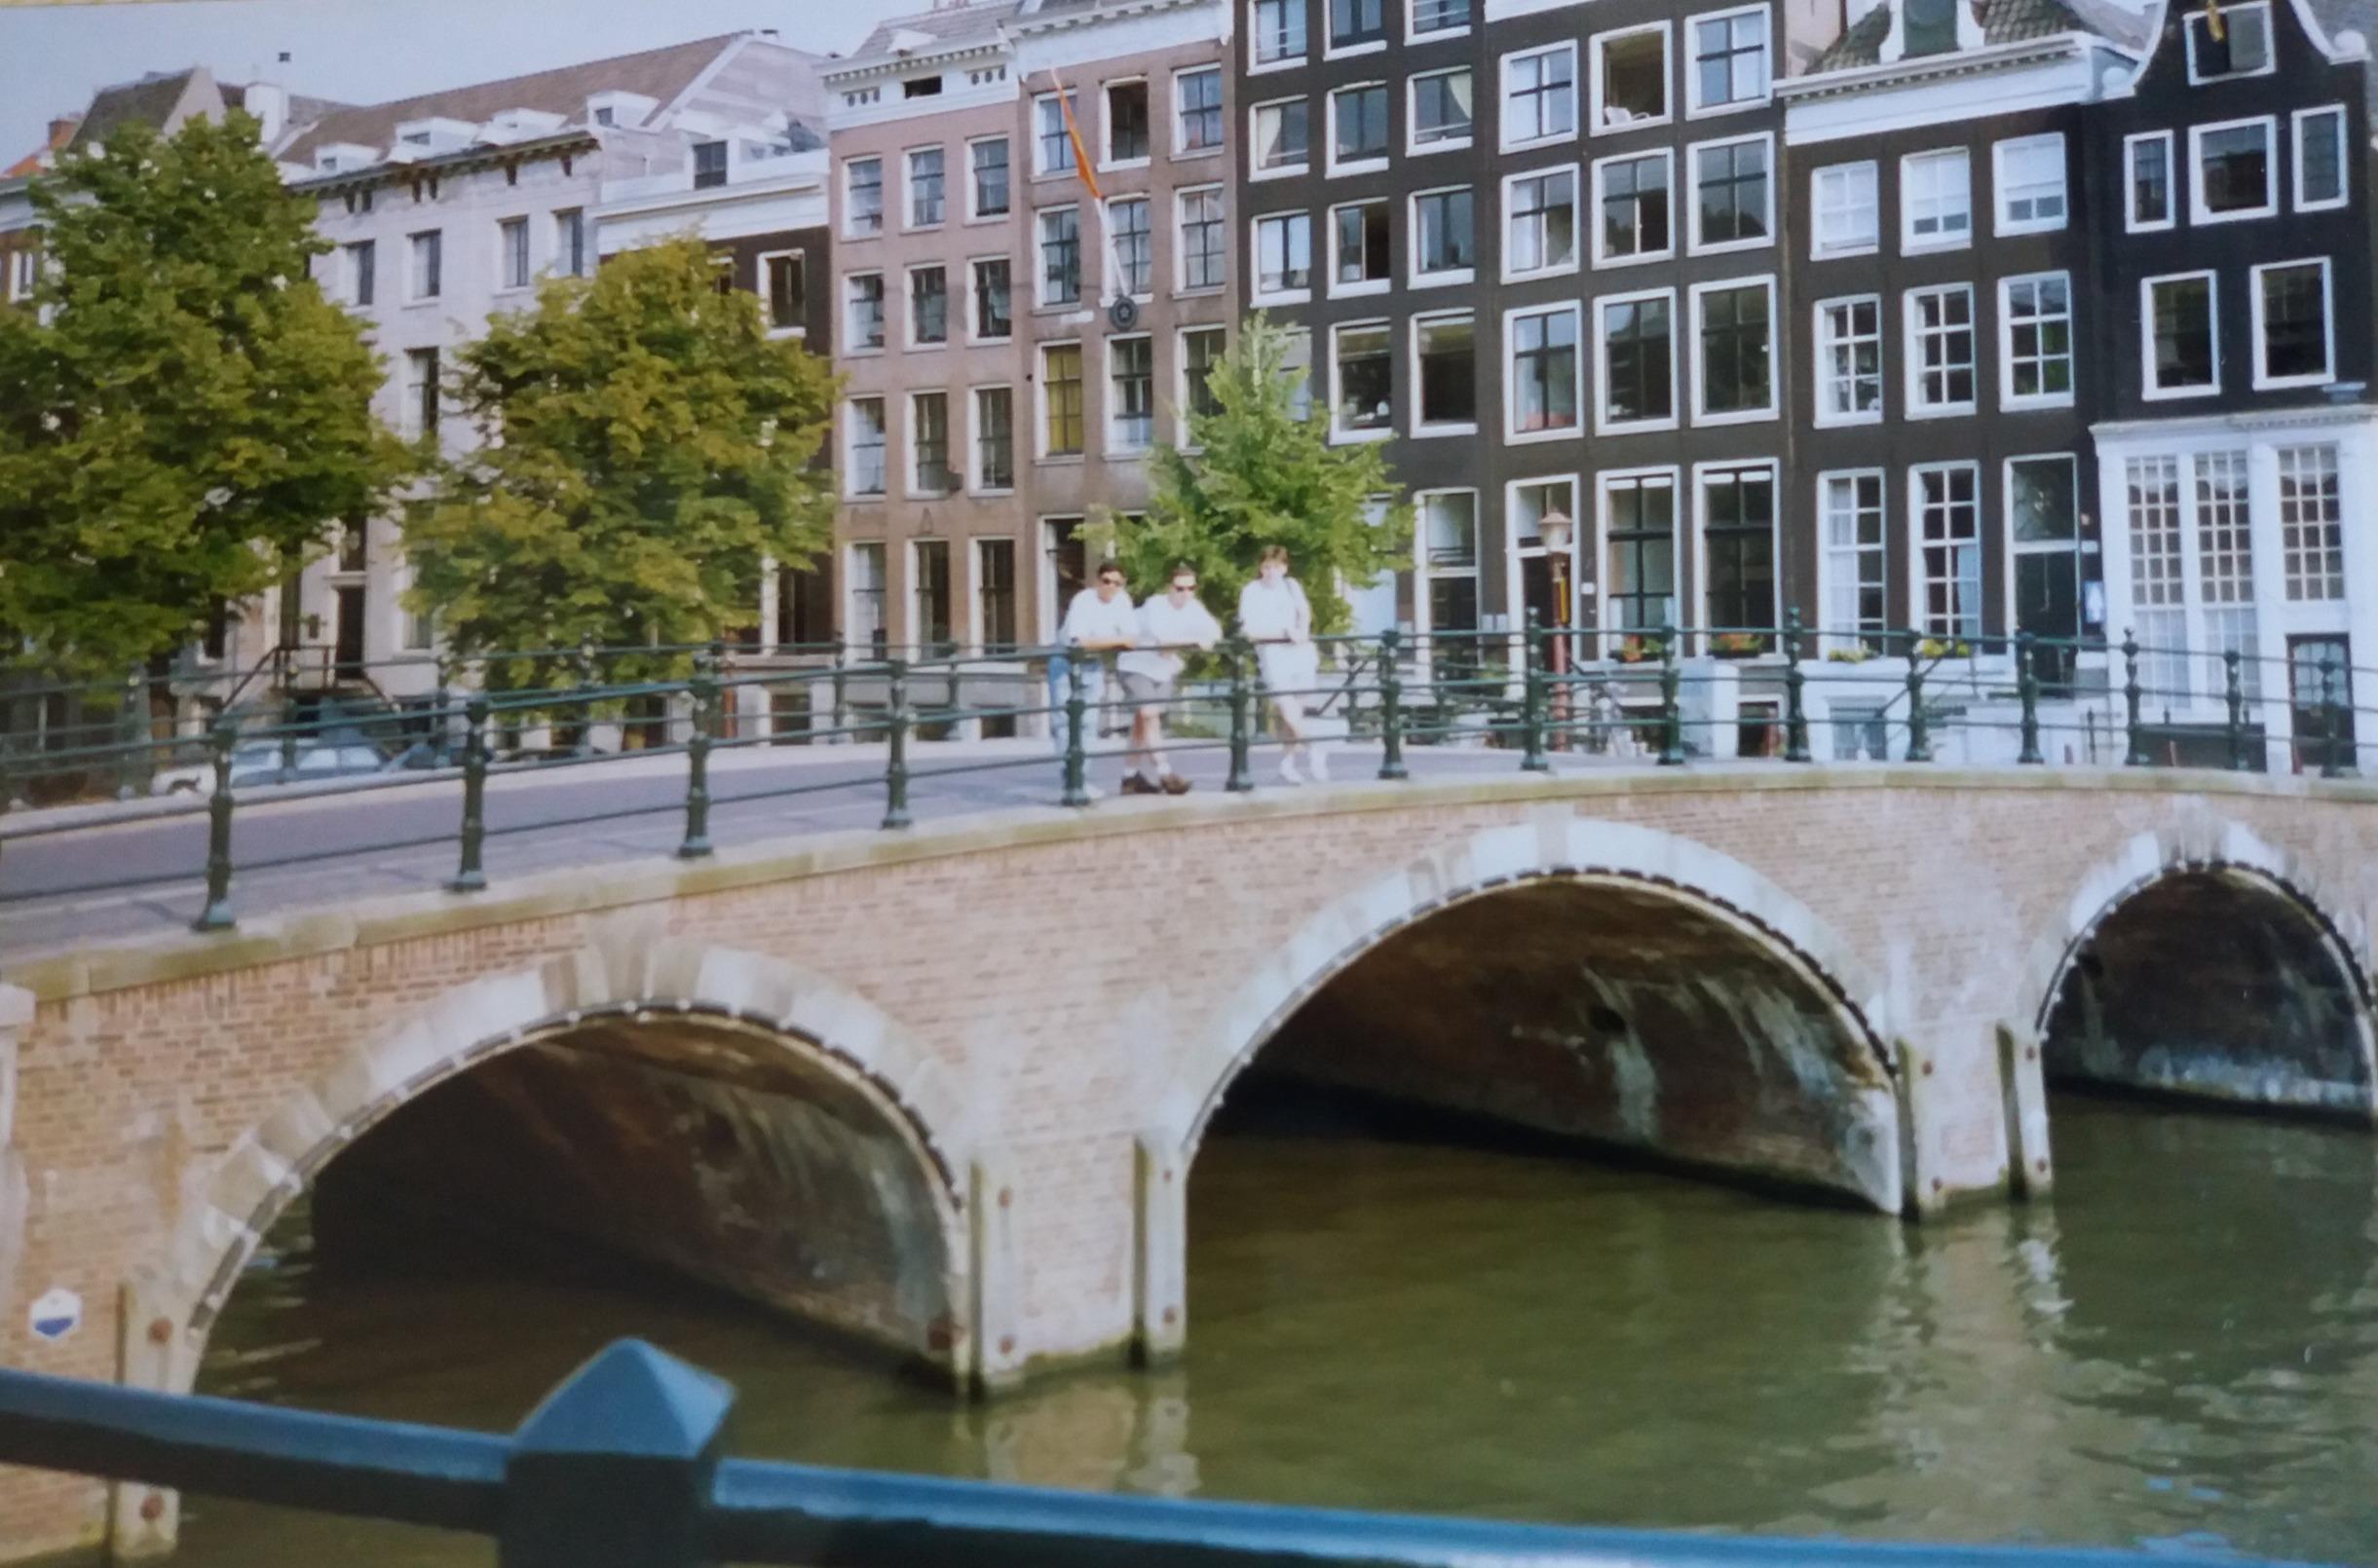 Europe diary - Day 3 - Amsterdam